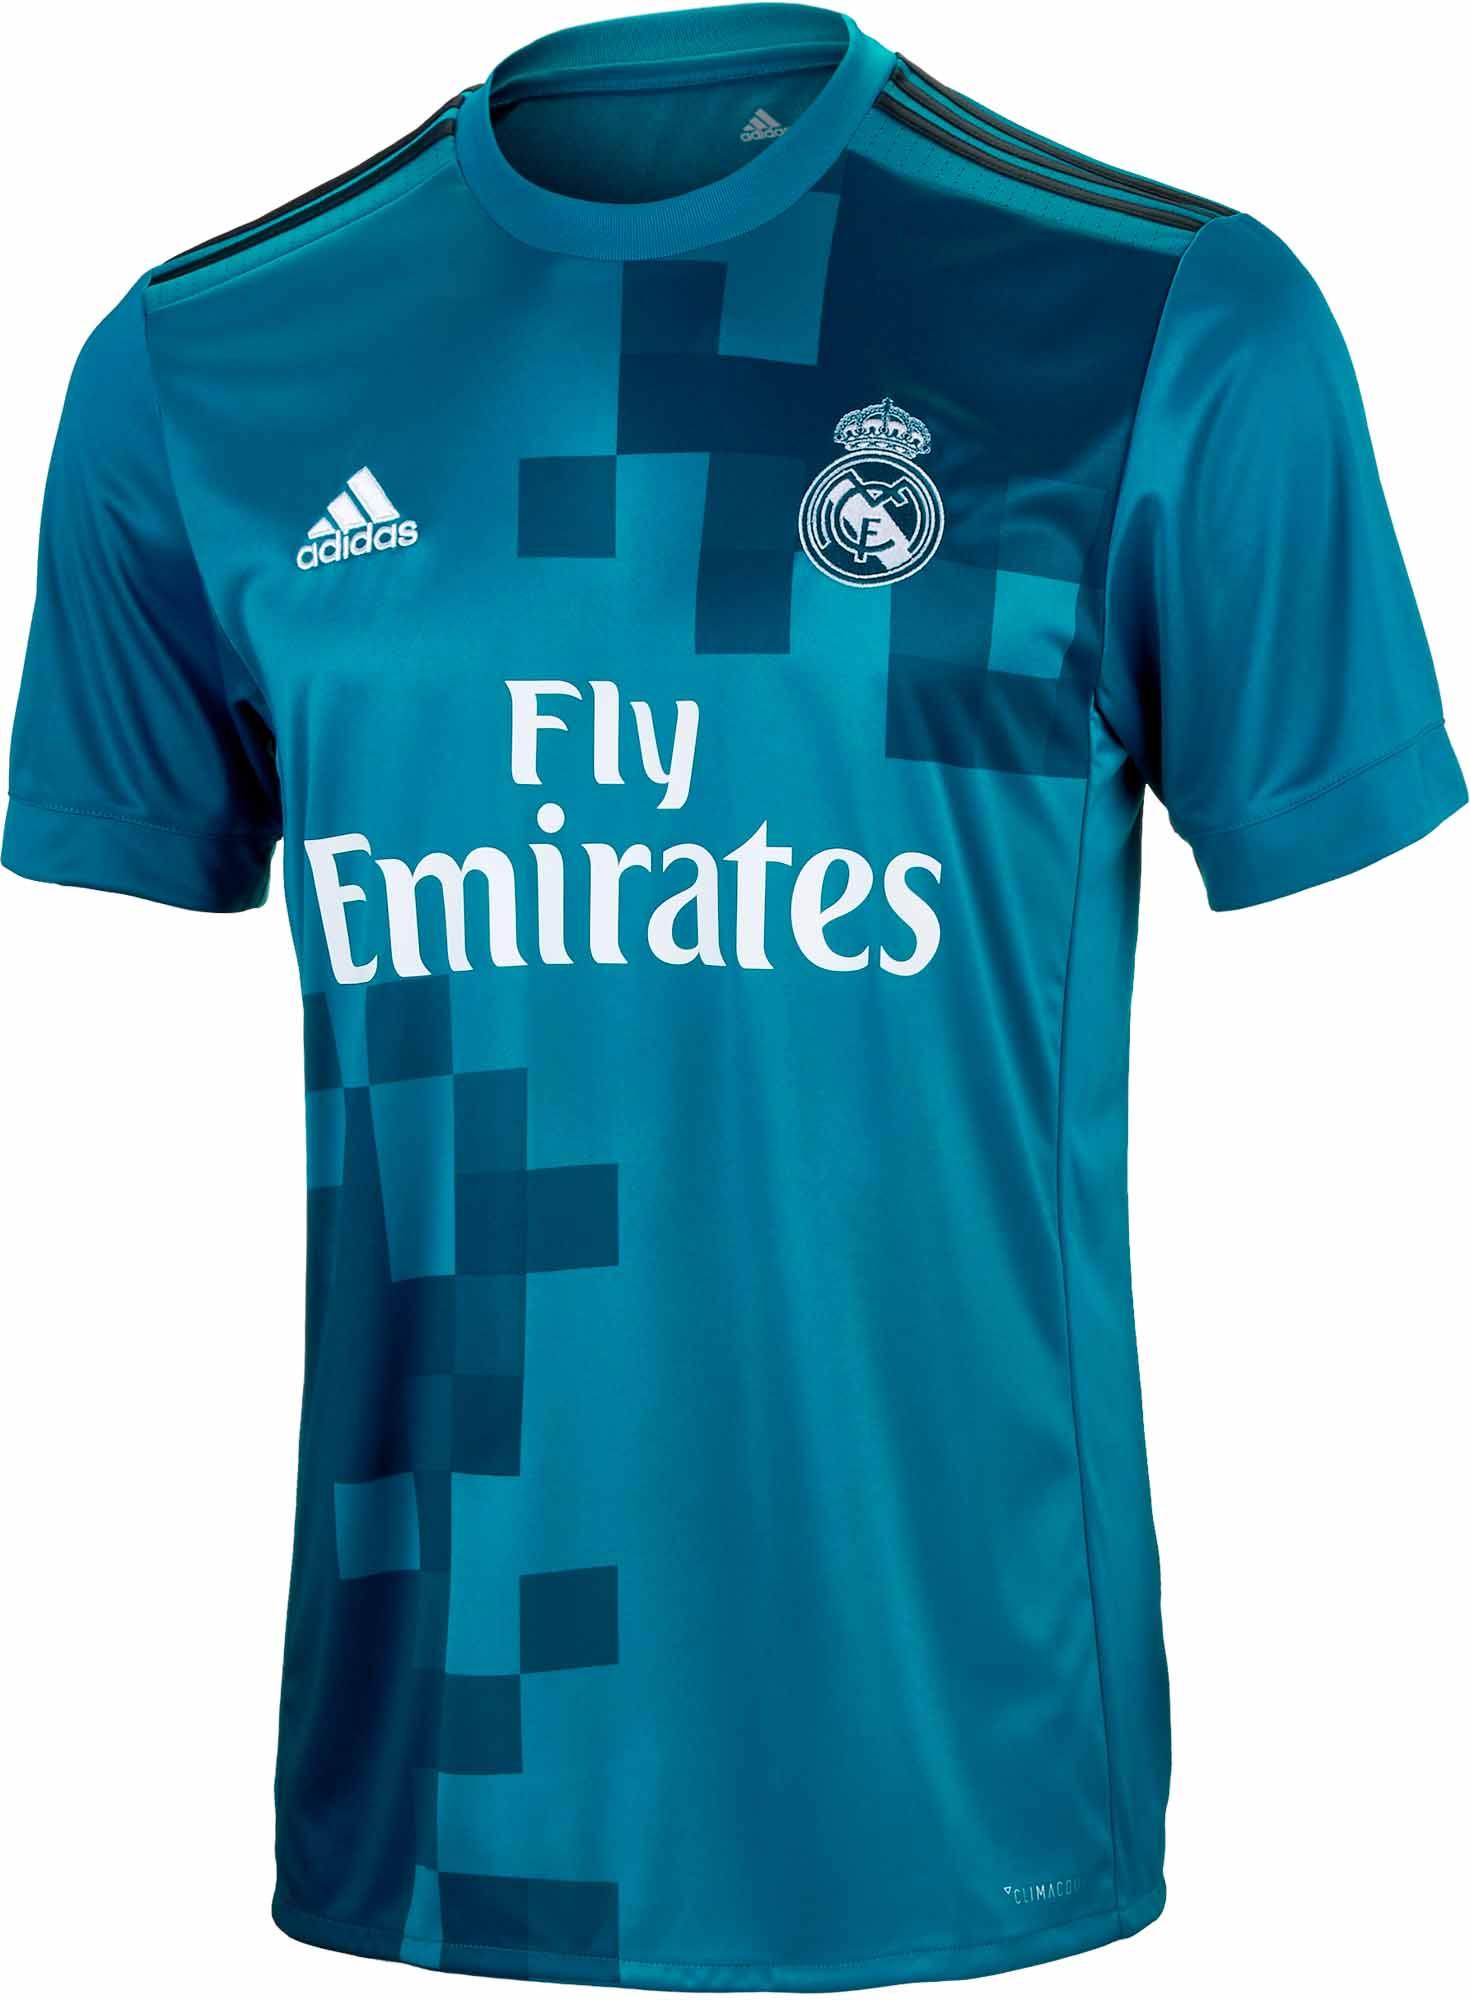 adidas Real Madrid 3rd Jersey - 2017 18 Soccer Jerseys 2ececfcdf